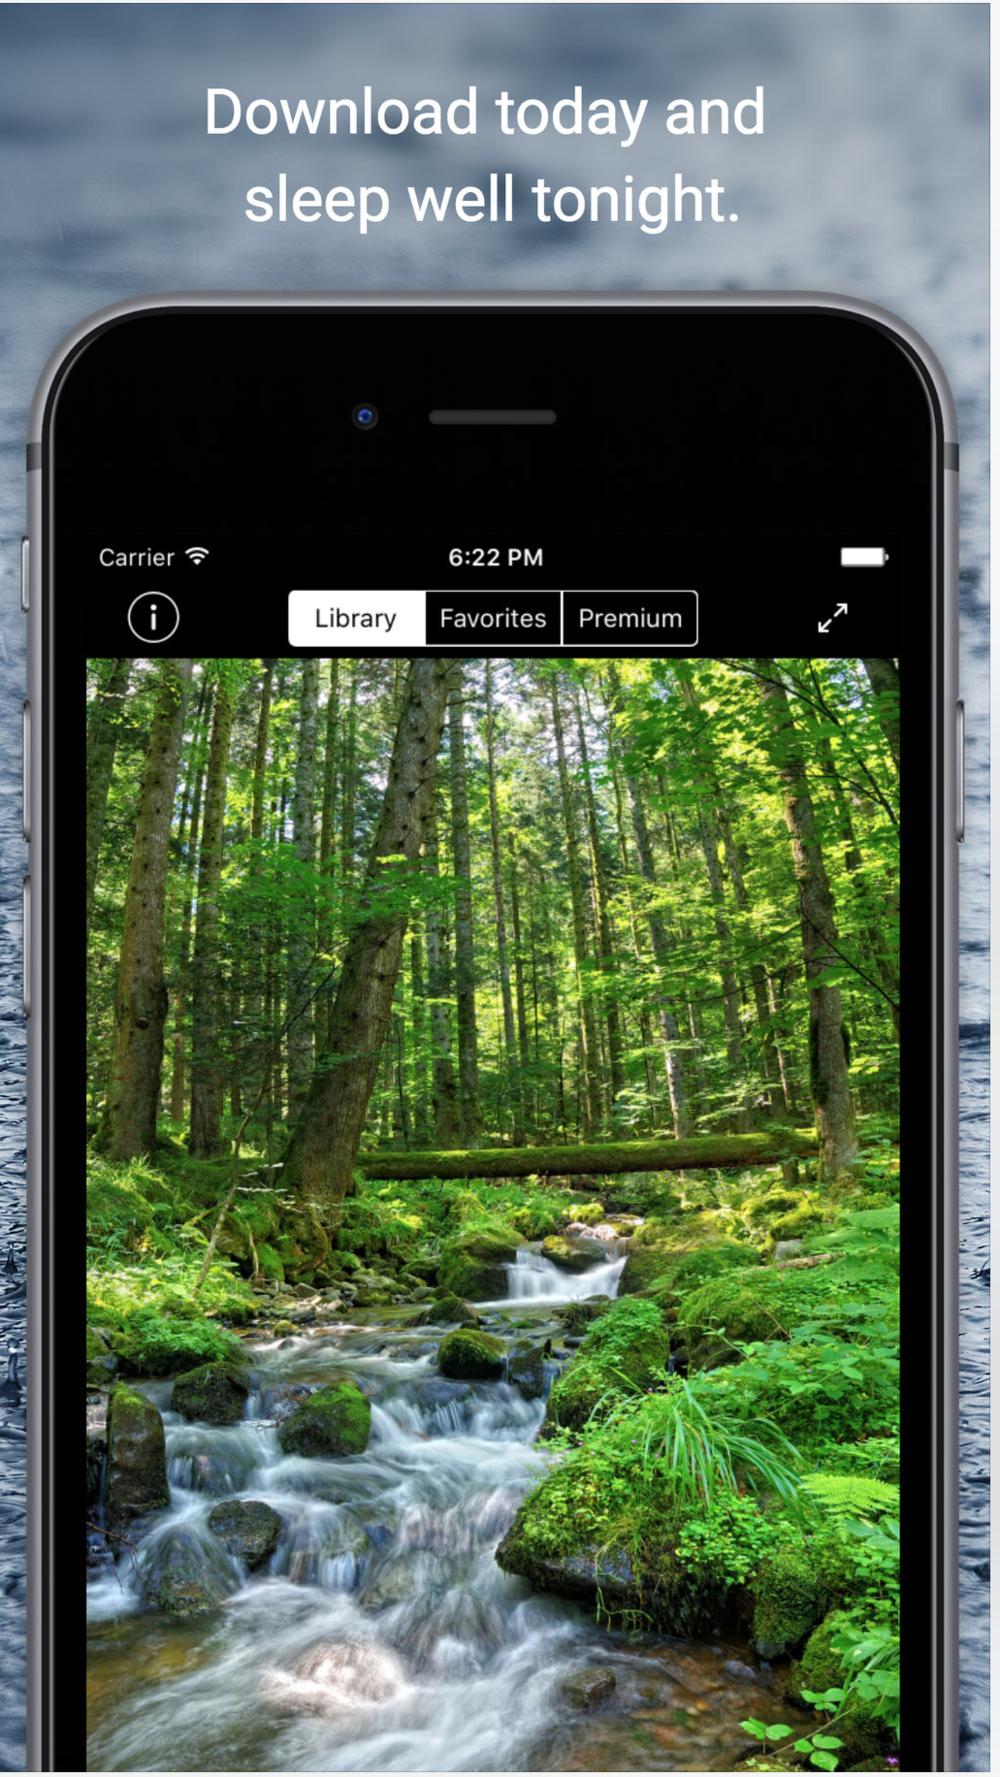 sam-c-perry-3-products-that-will-help-you-sleep-better-rain-rain-app-image-5.jpg